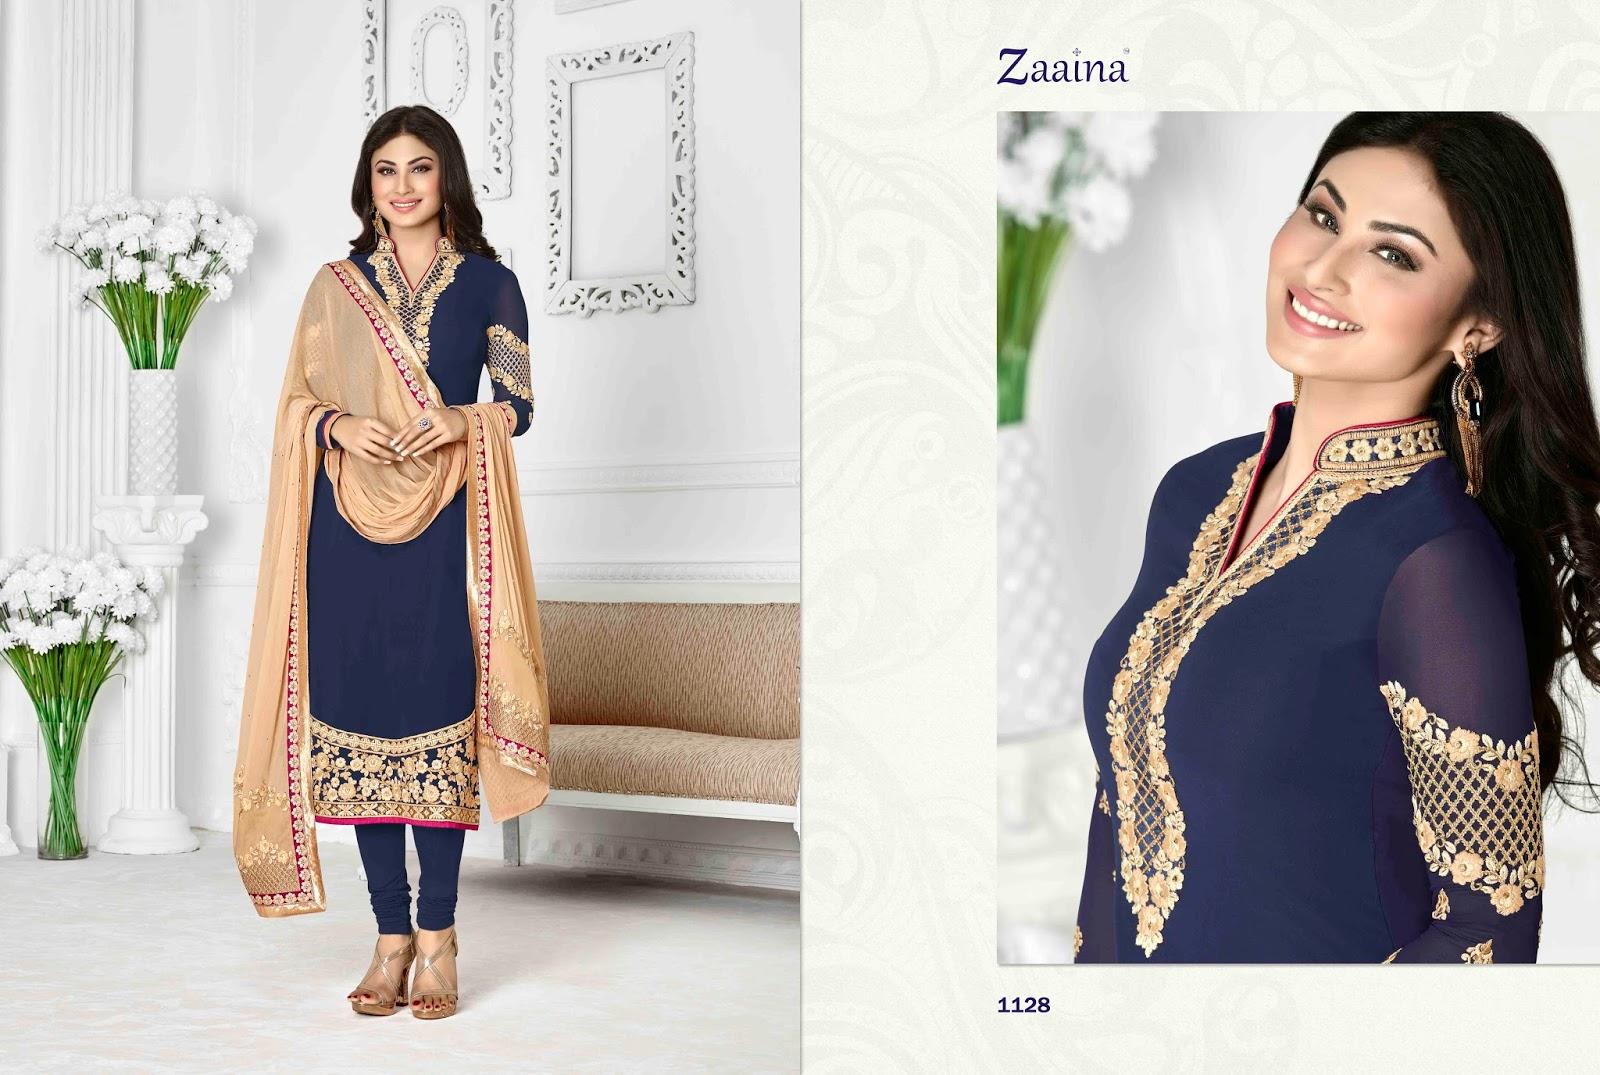 Zaaina Vol 4 – Embroidery Excellent designer Salwar Kameez